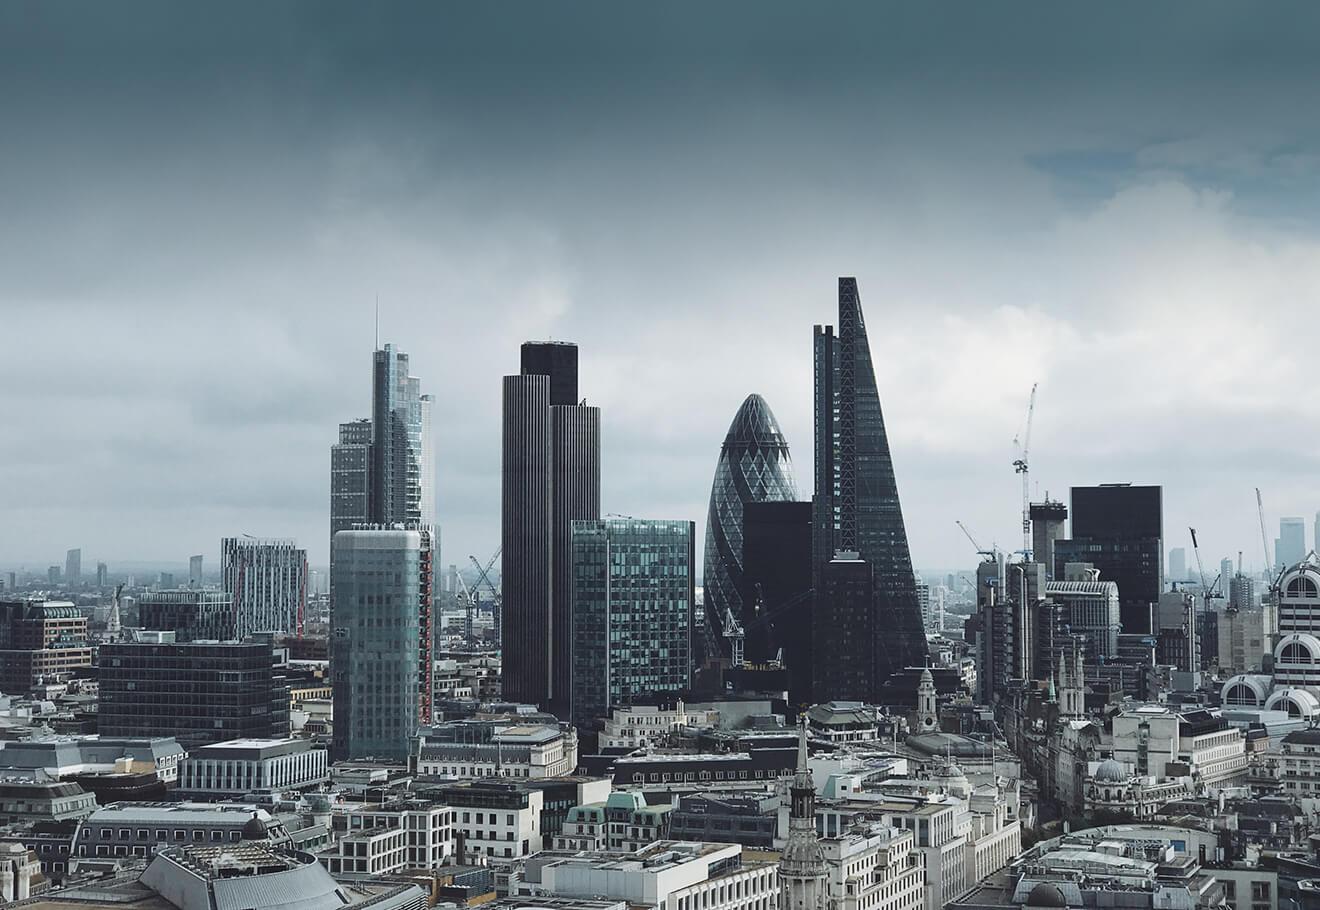 London sky view